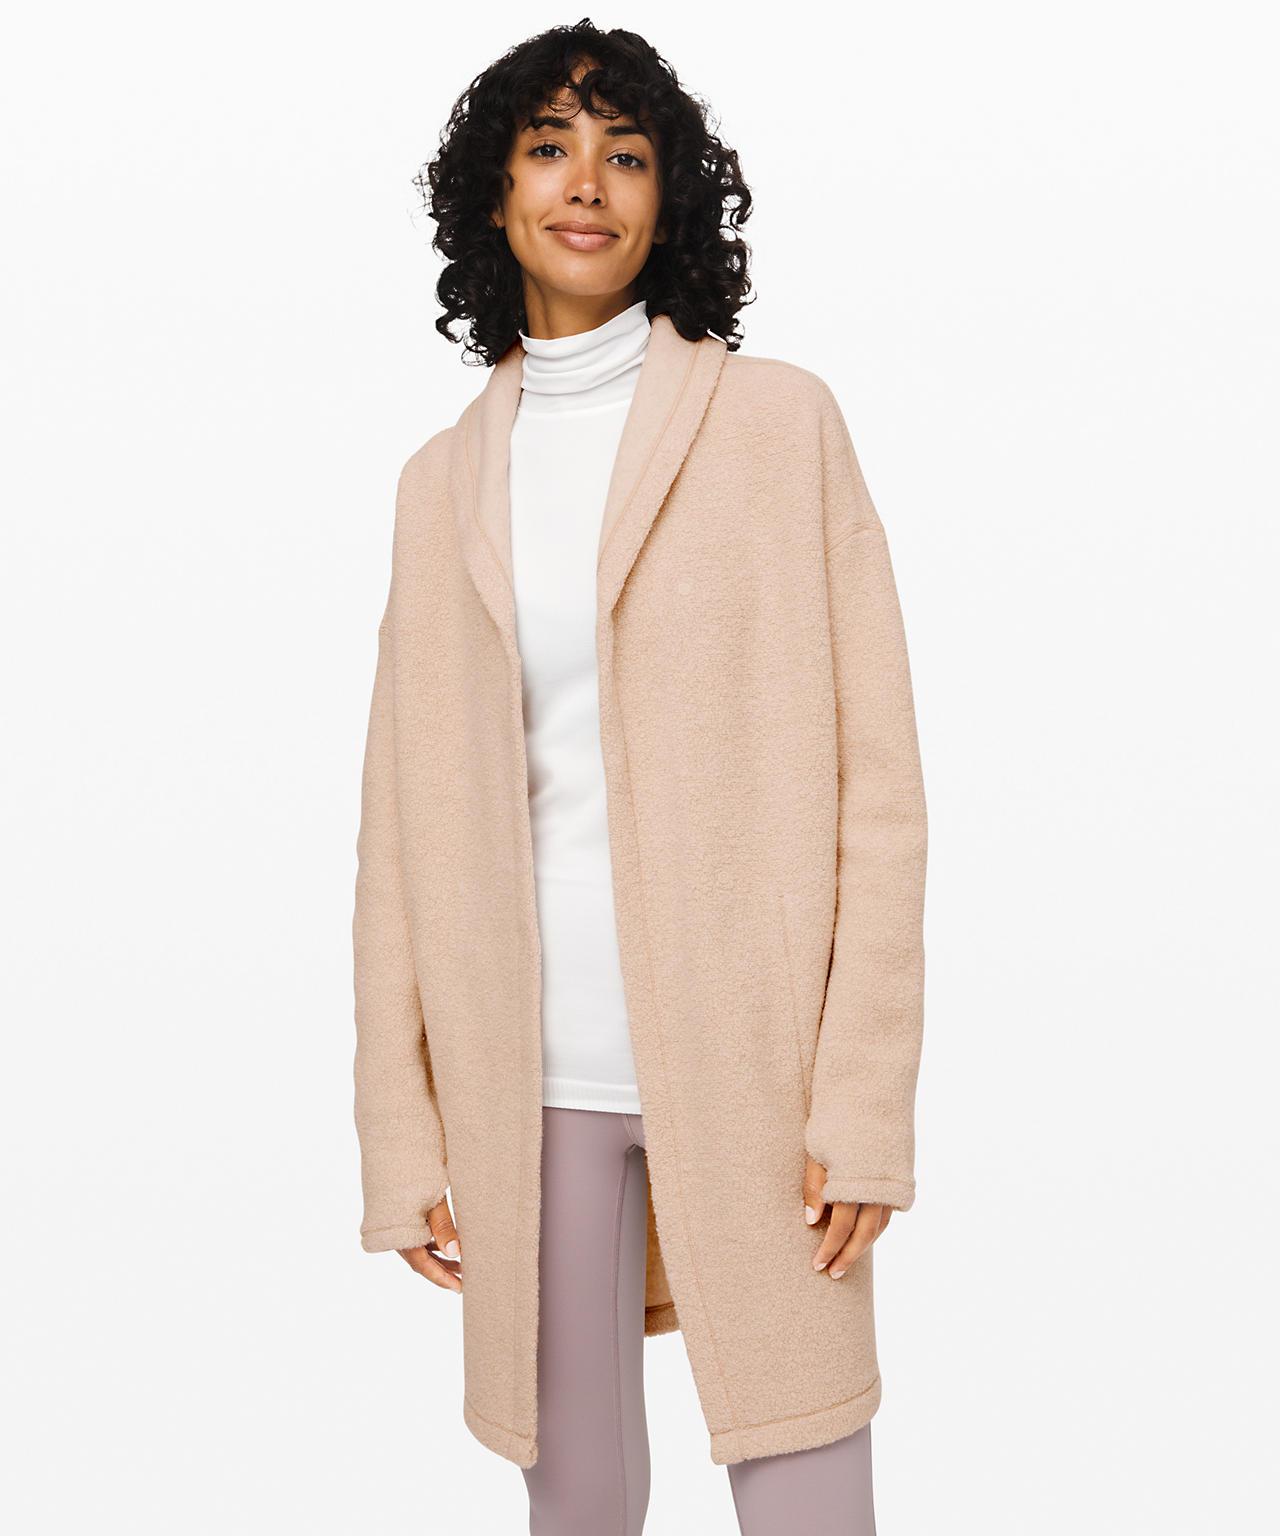 Sincerely Sherpa wrap, Lululemon Upload, lululemon cozy wrap sweaters